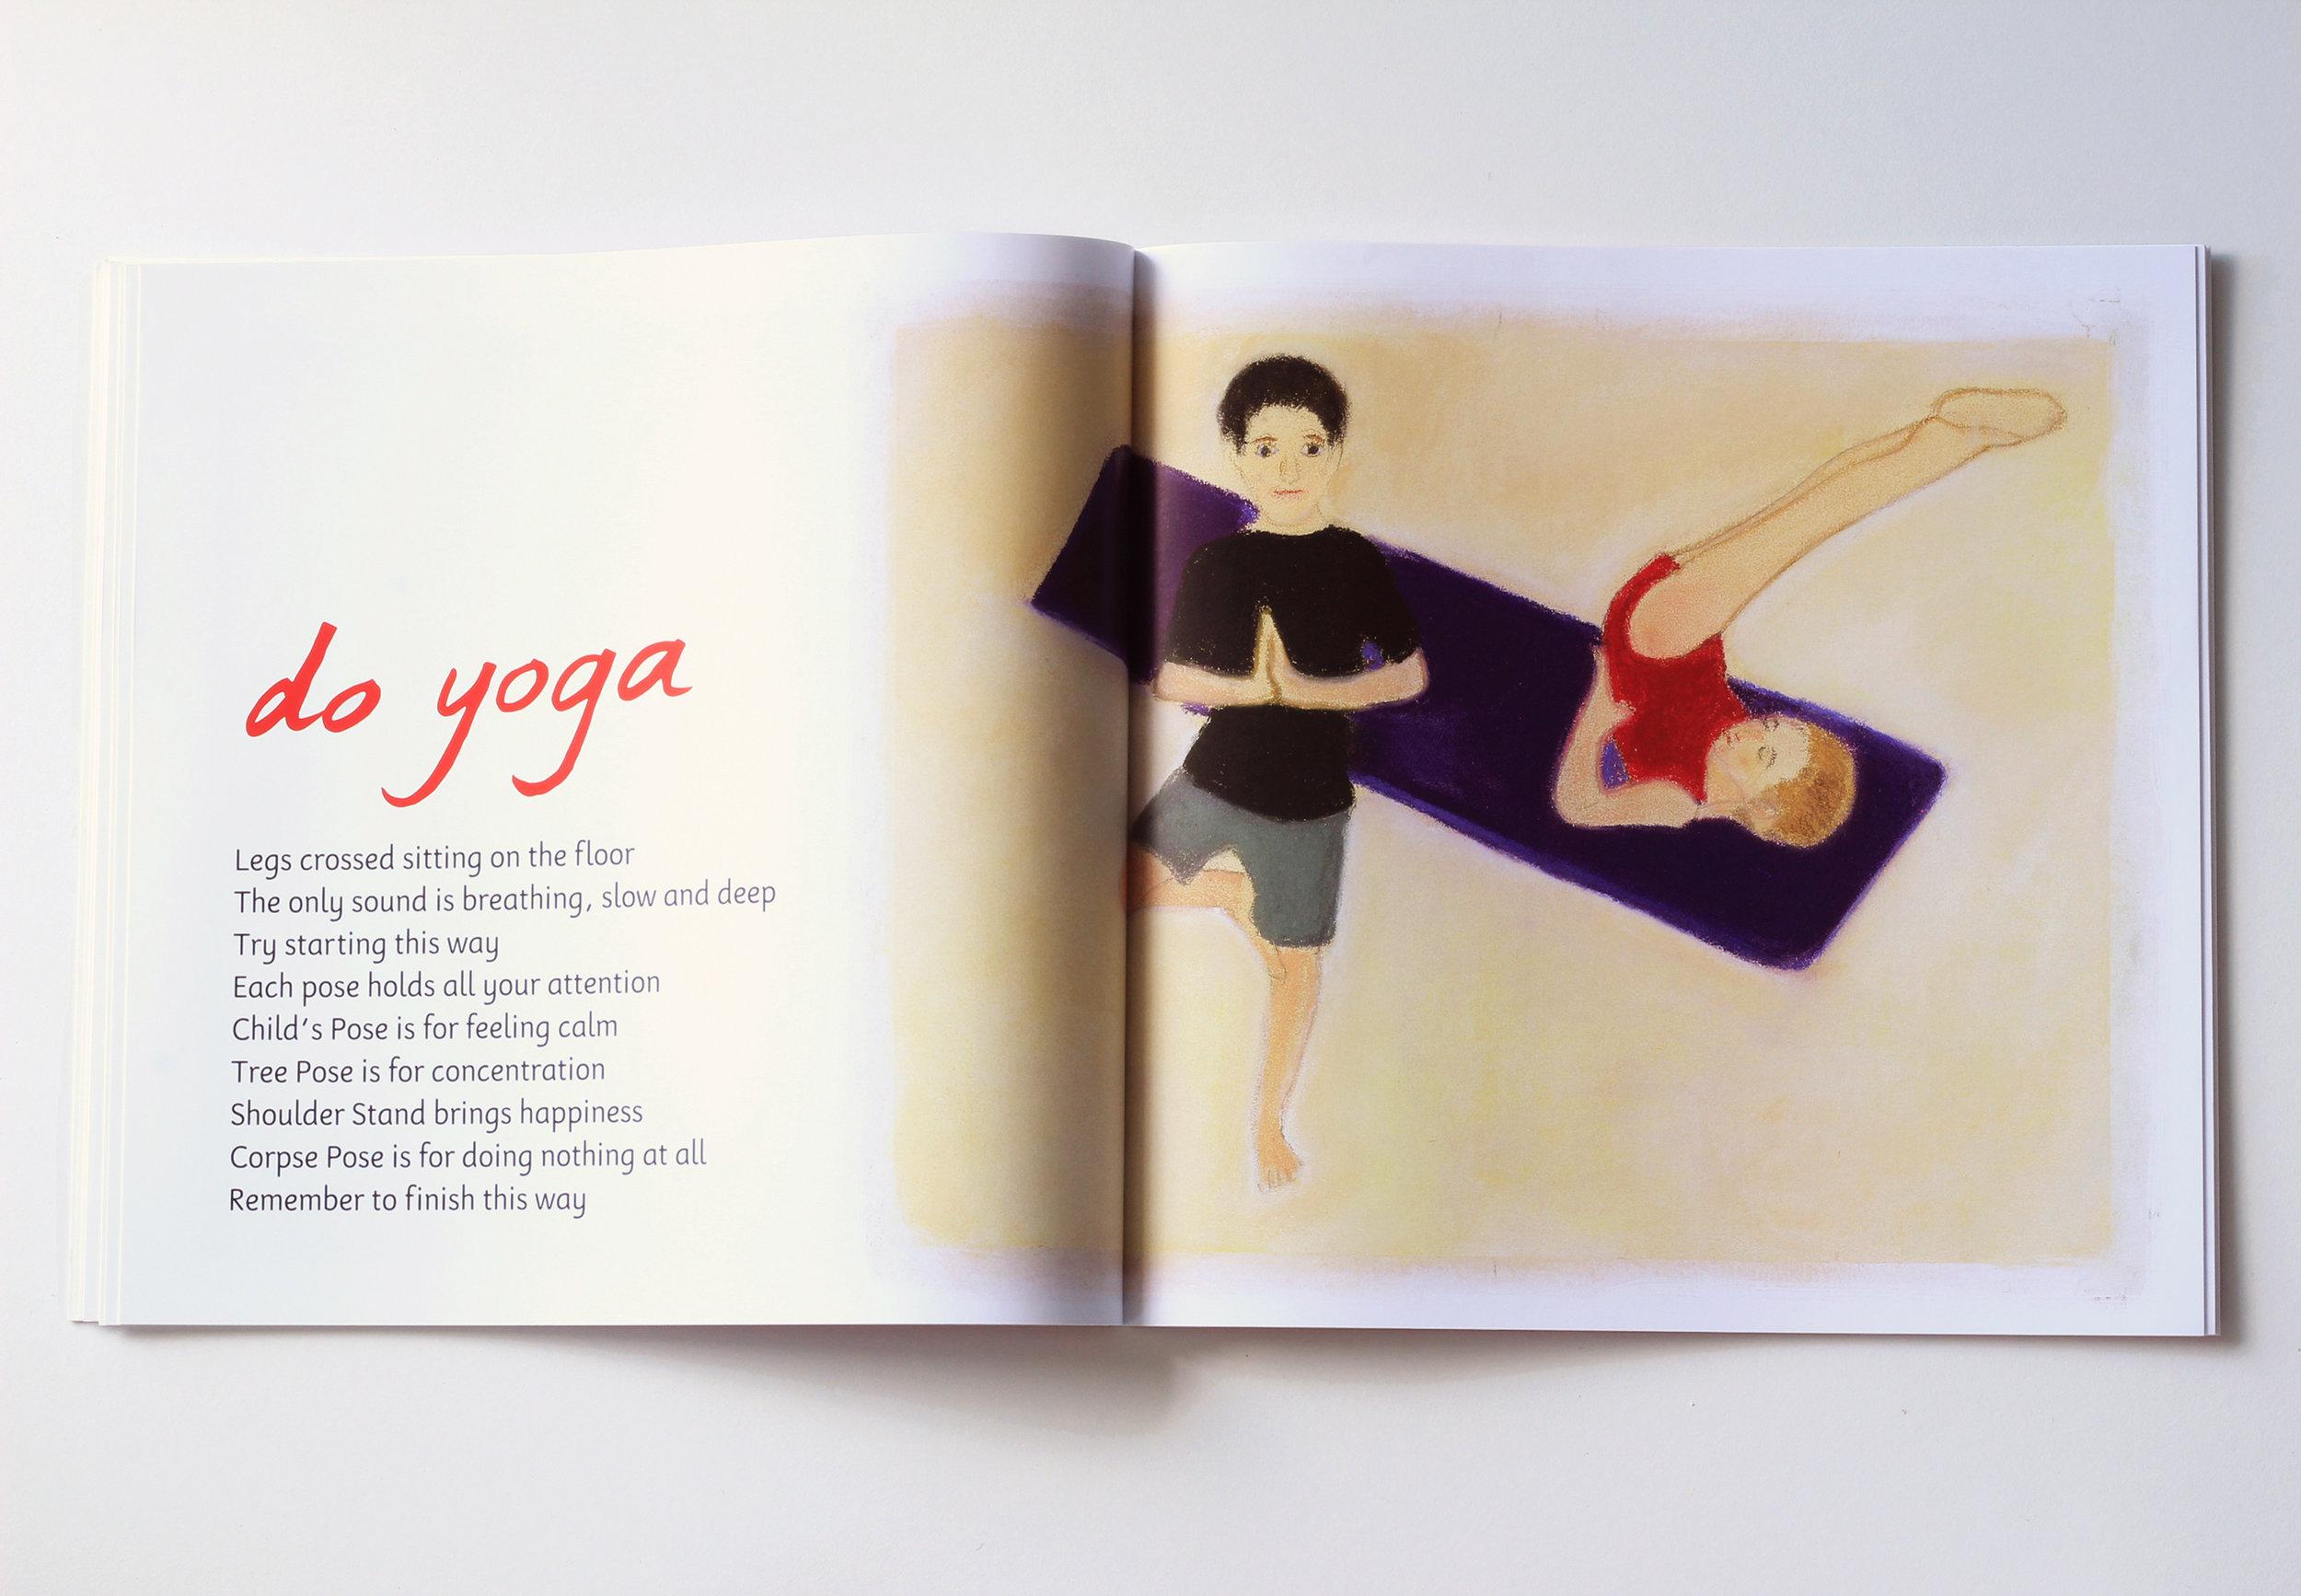 do yoga_edit.jpg